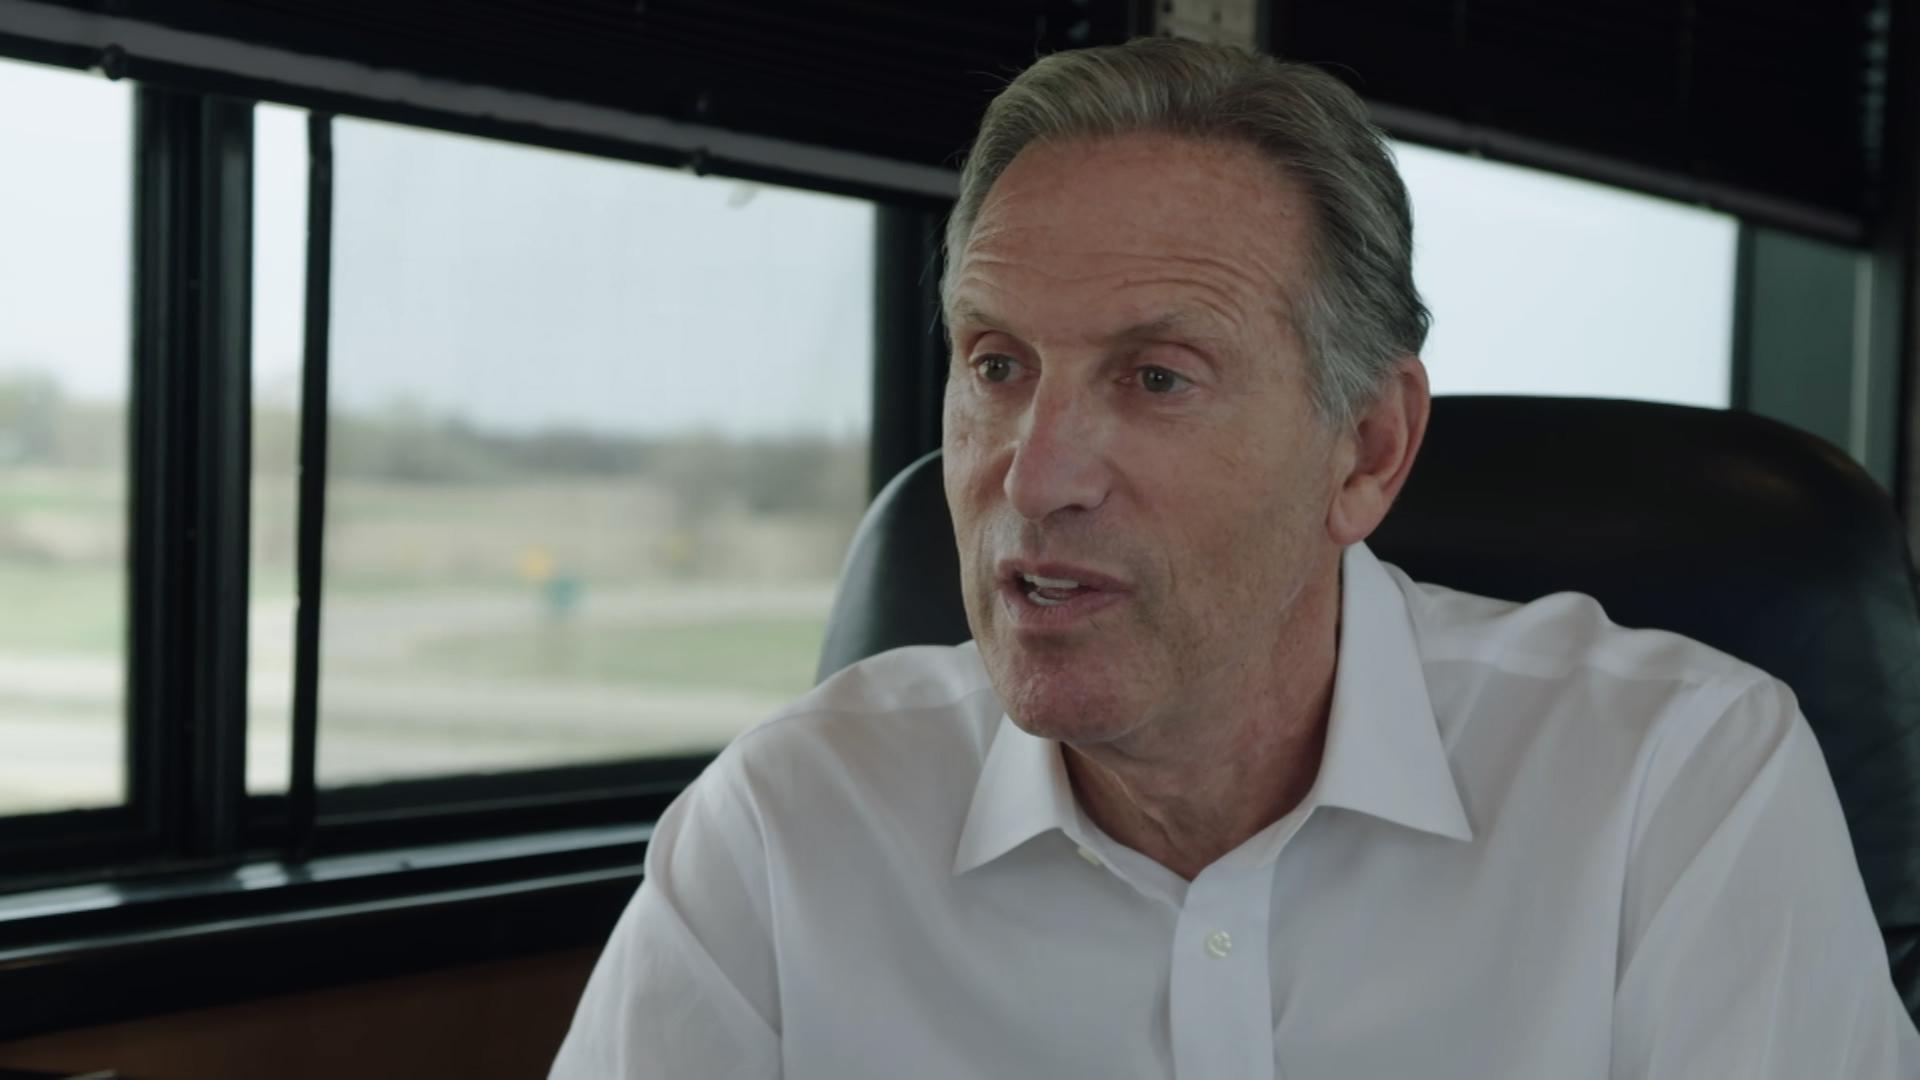 Howard Schultz thinks he's the right billionaire for America